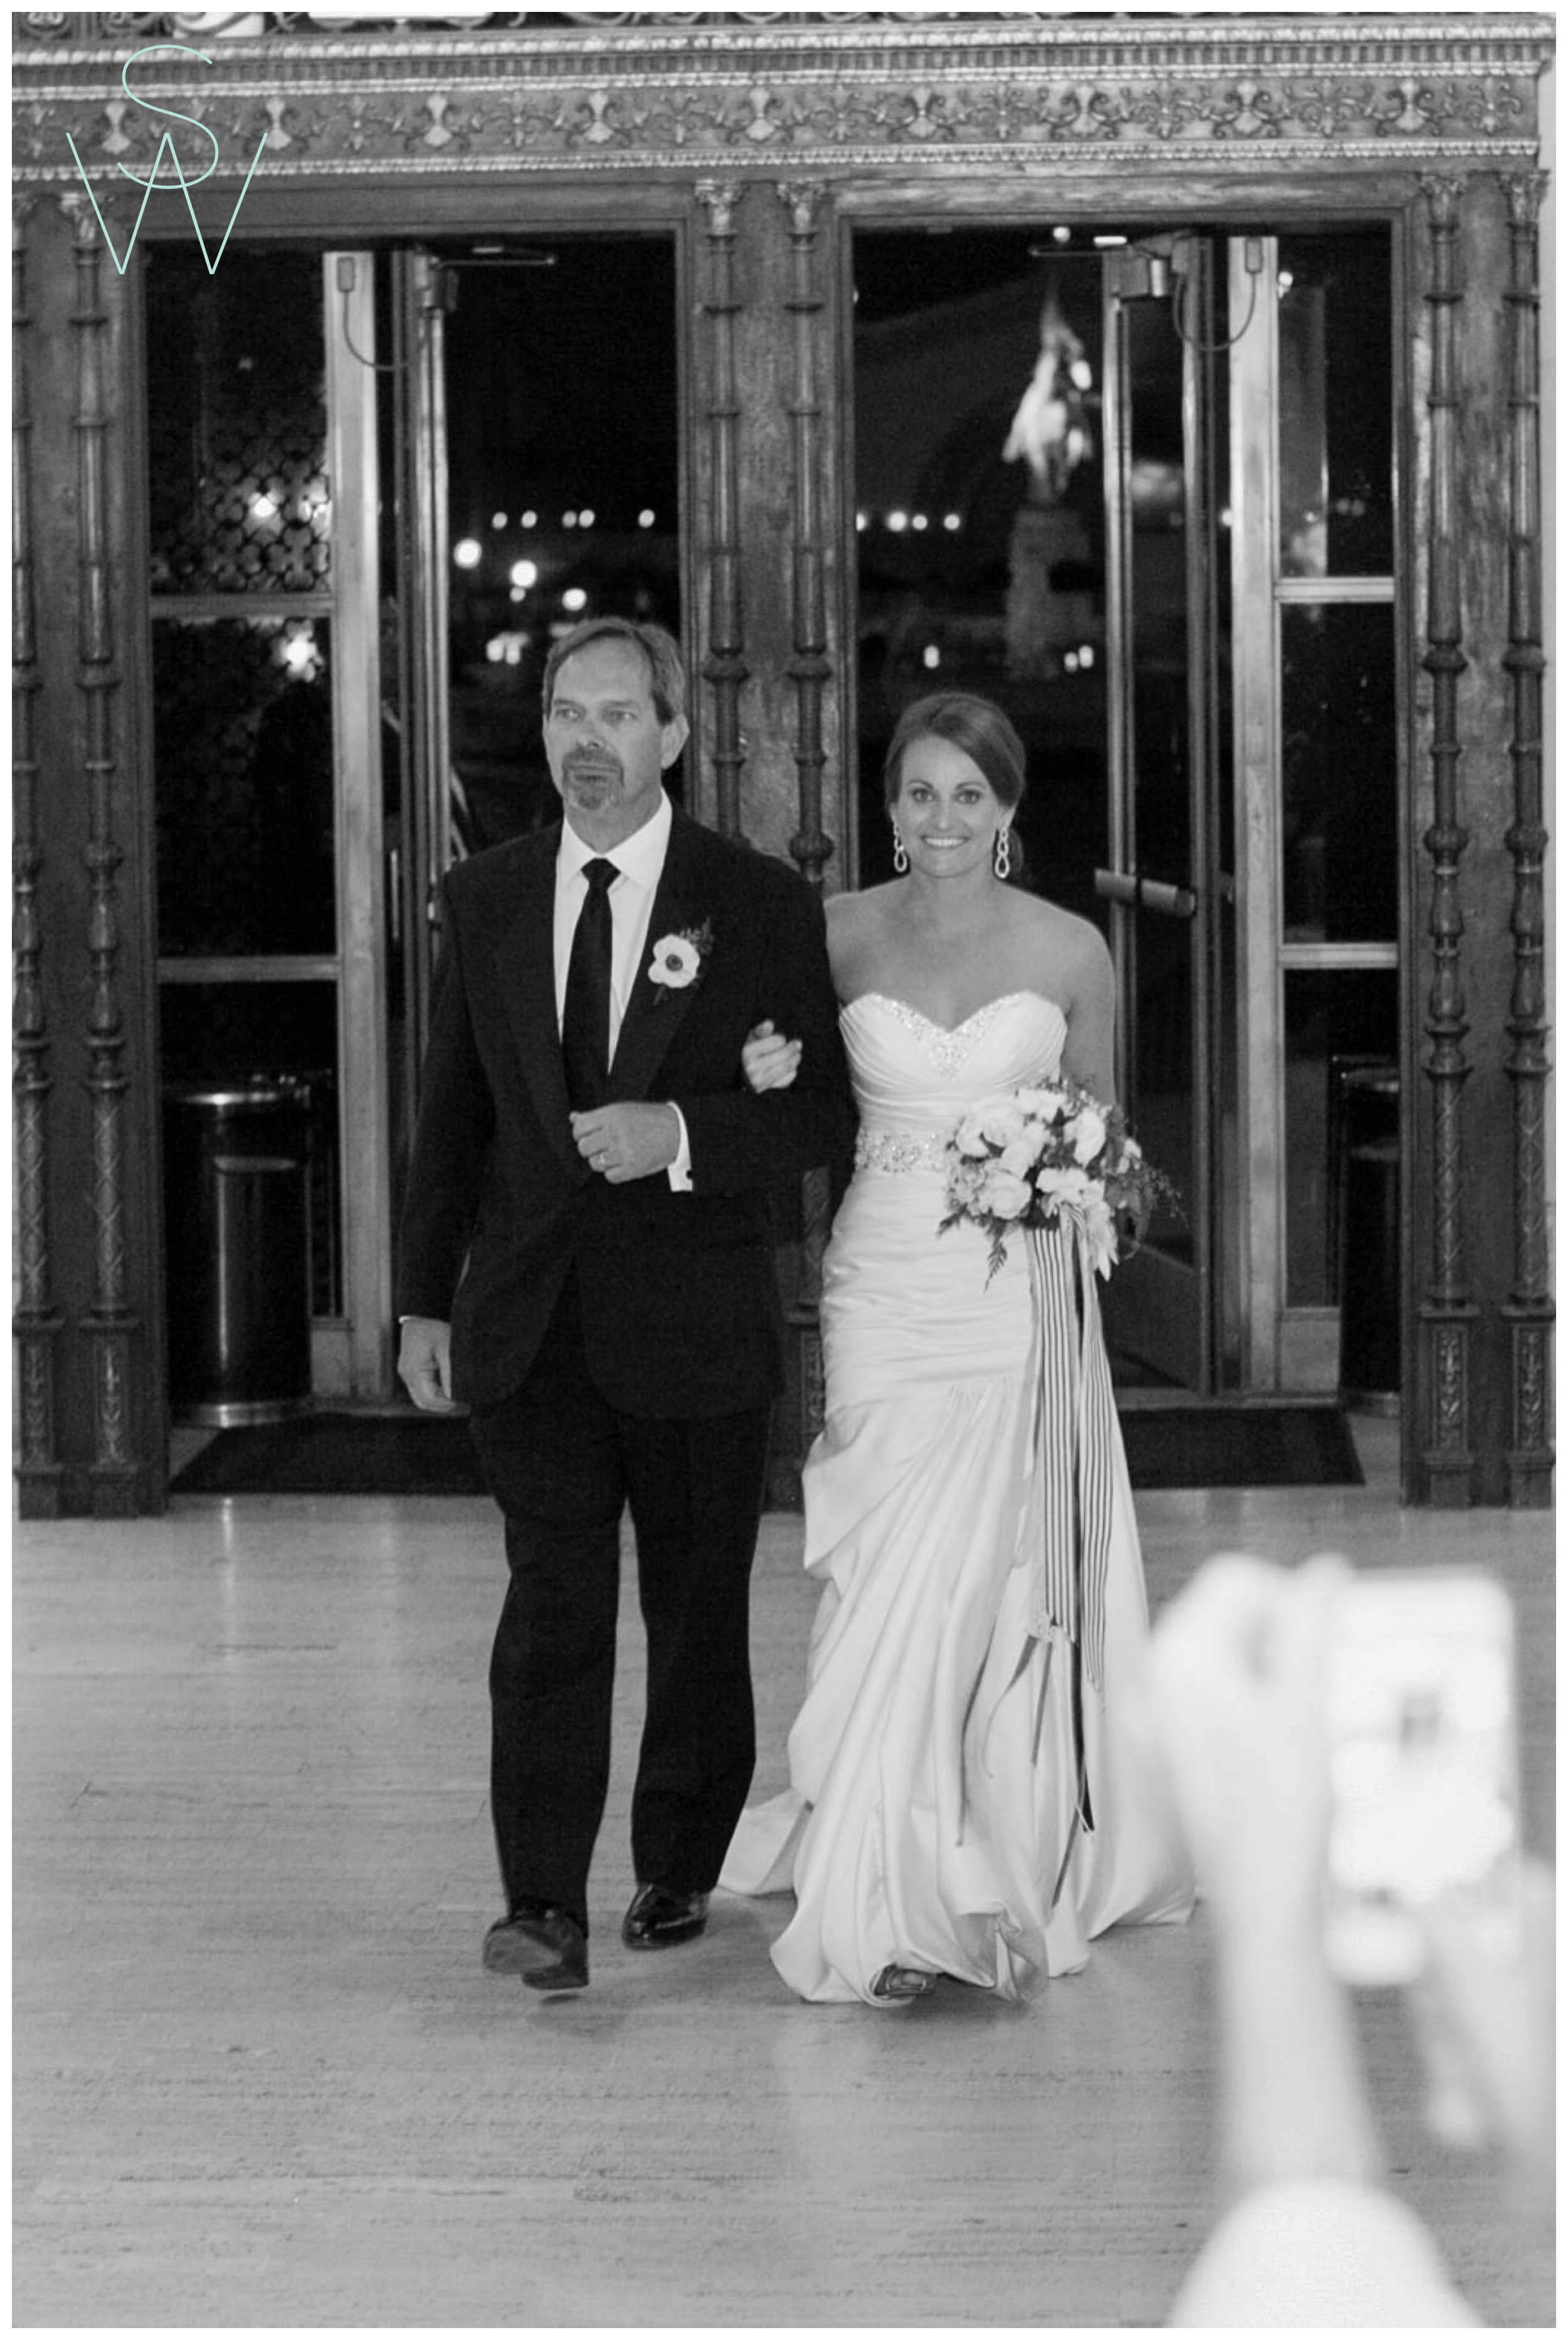 Shewanders.sdma_.wedding.photography-1050.jpg.wedding.photography-1050.jpg